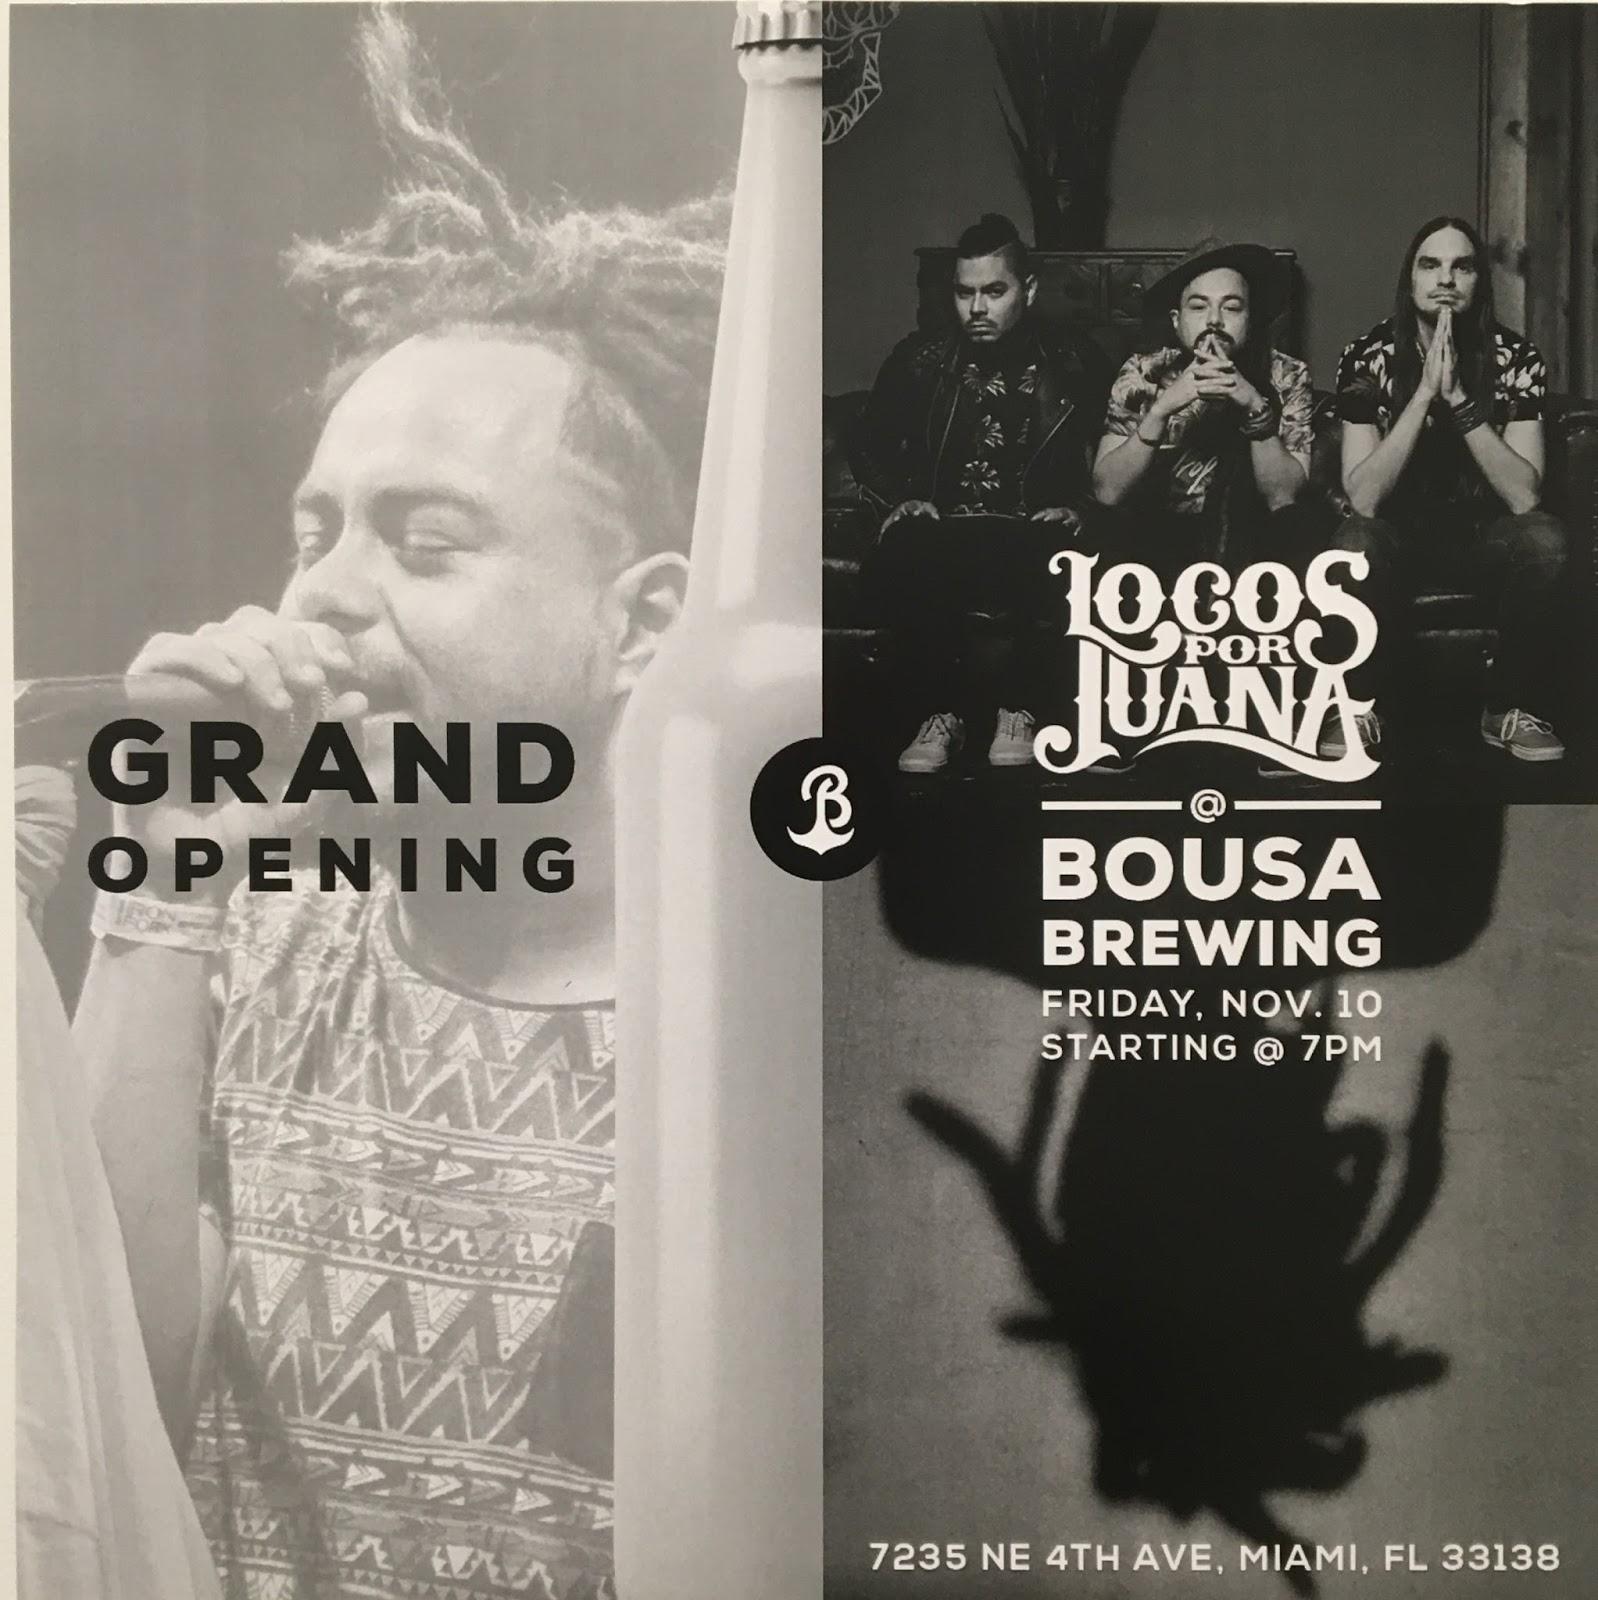 4983561da13 Bousa Brewing can be found at 7235 NE 4th Avenue